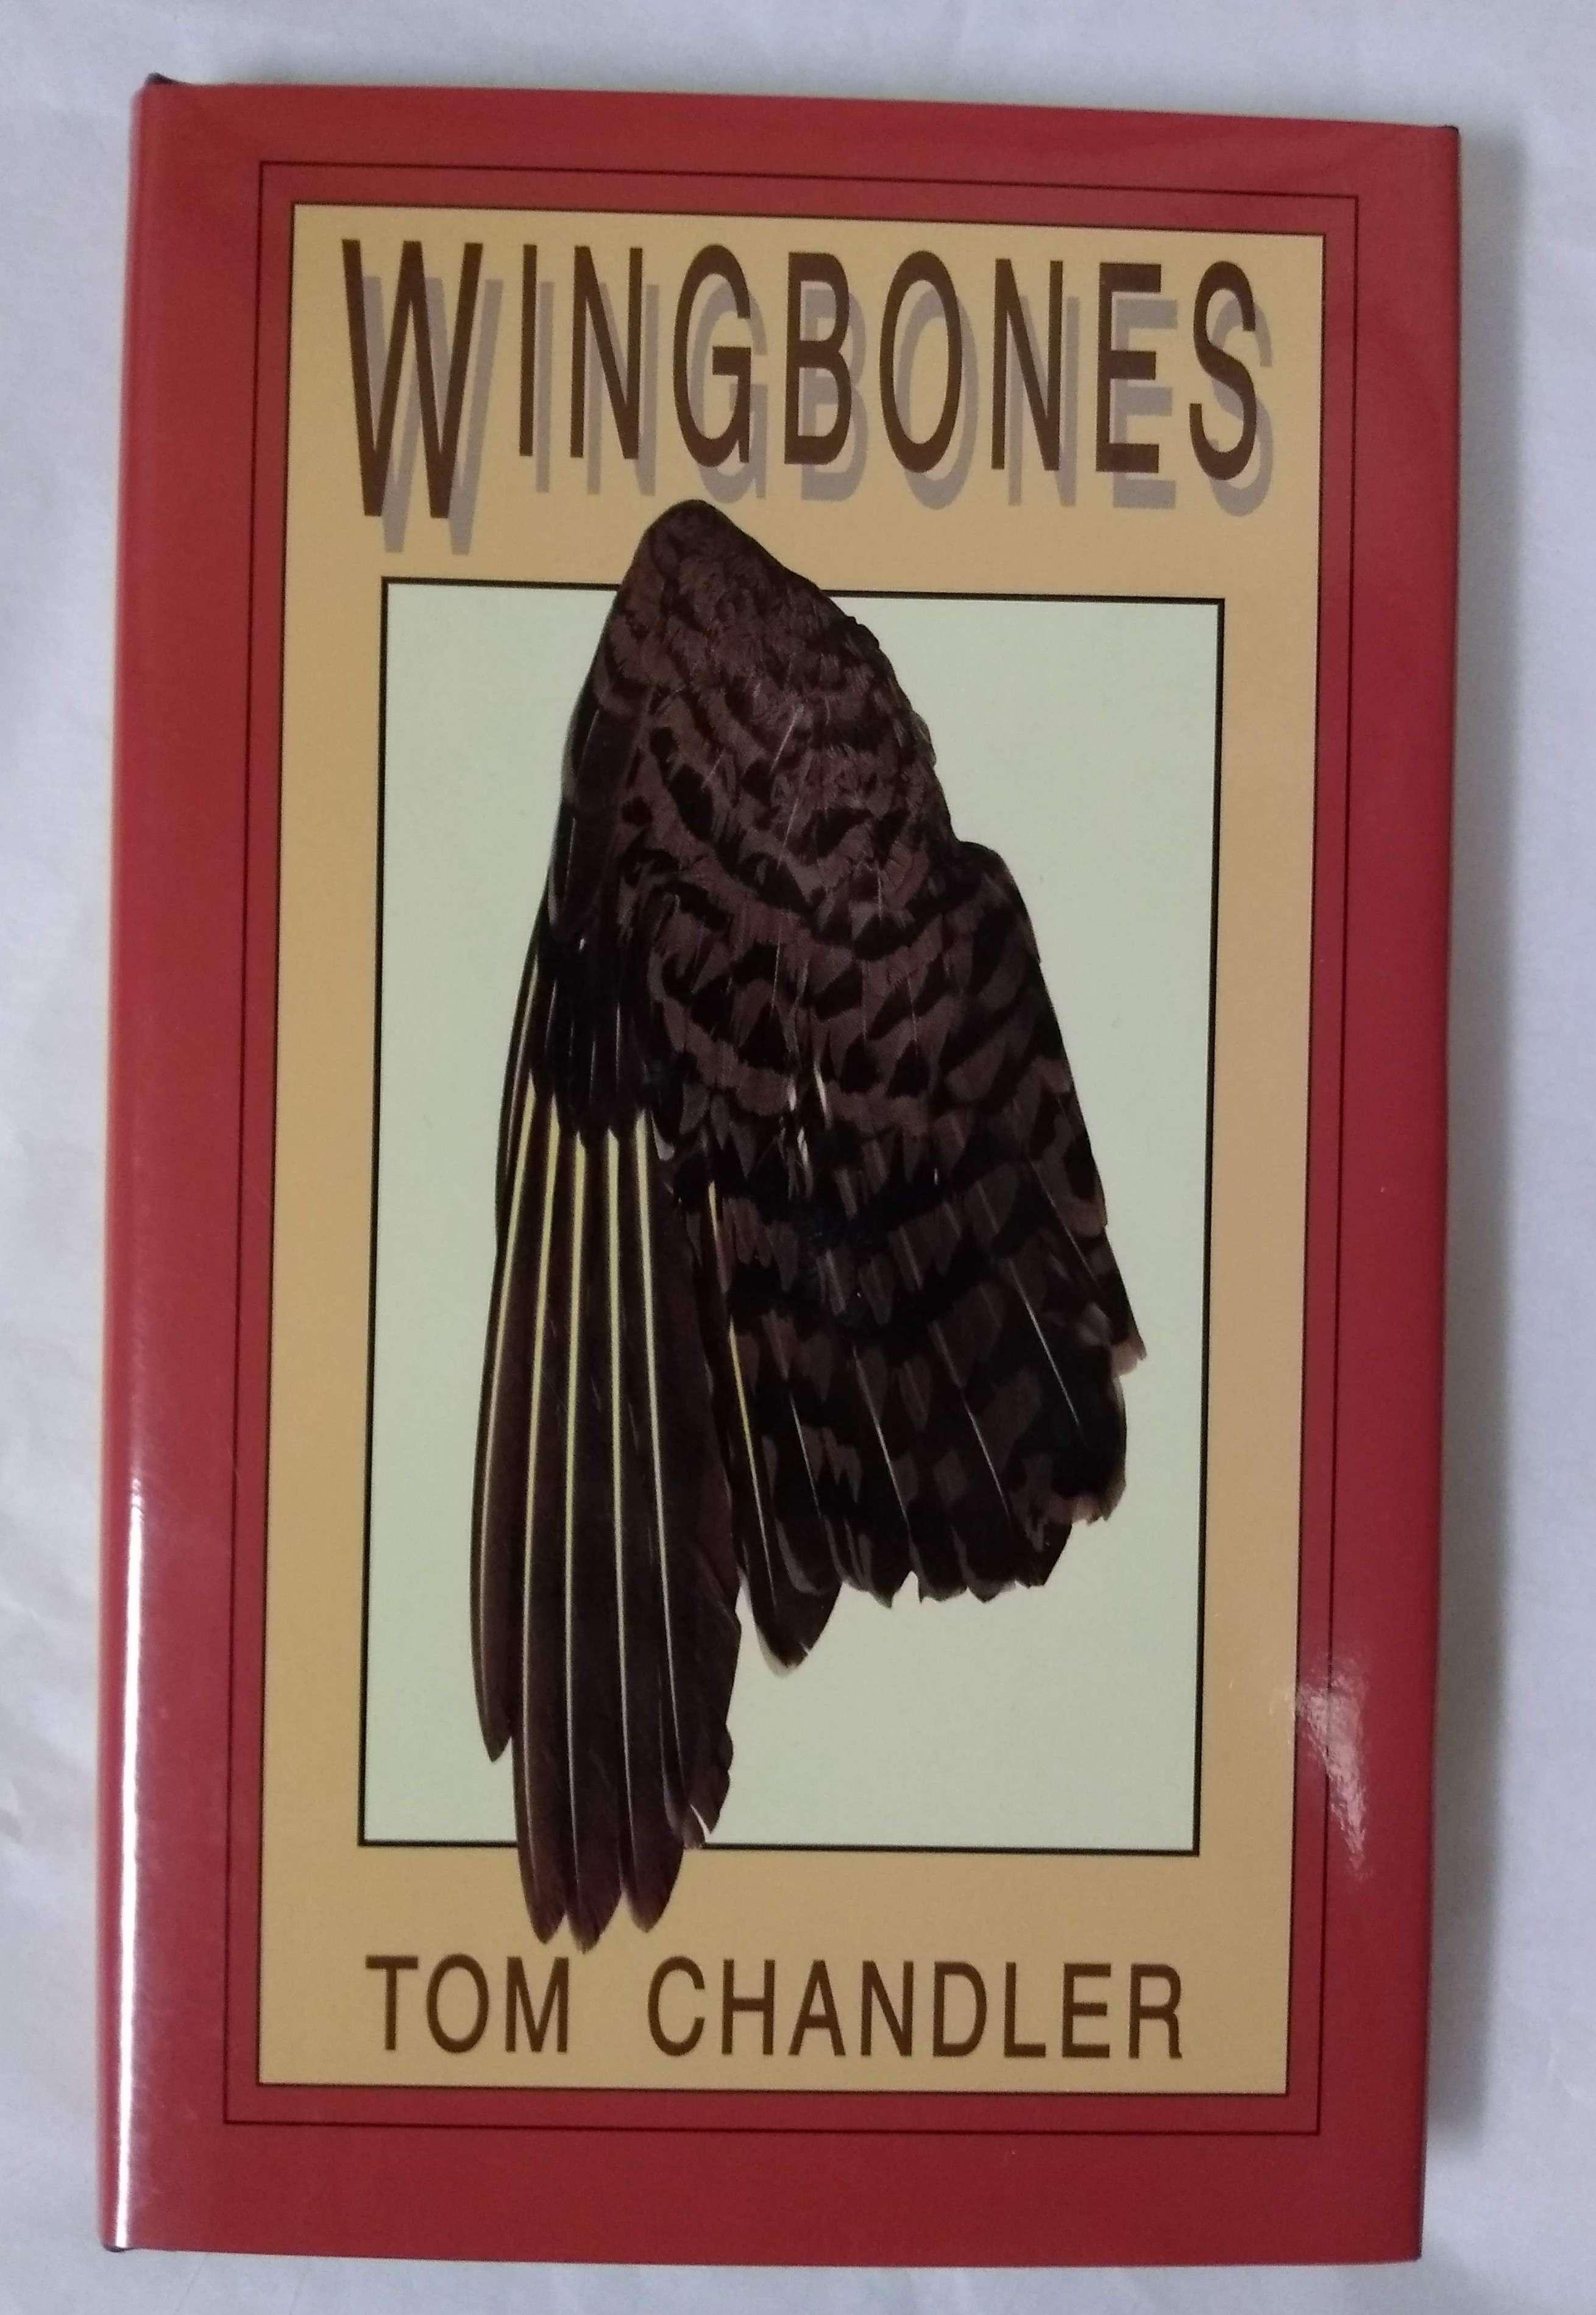 Wingbones (Signal Books Signature Poets Series), Chandler, Tom